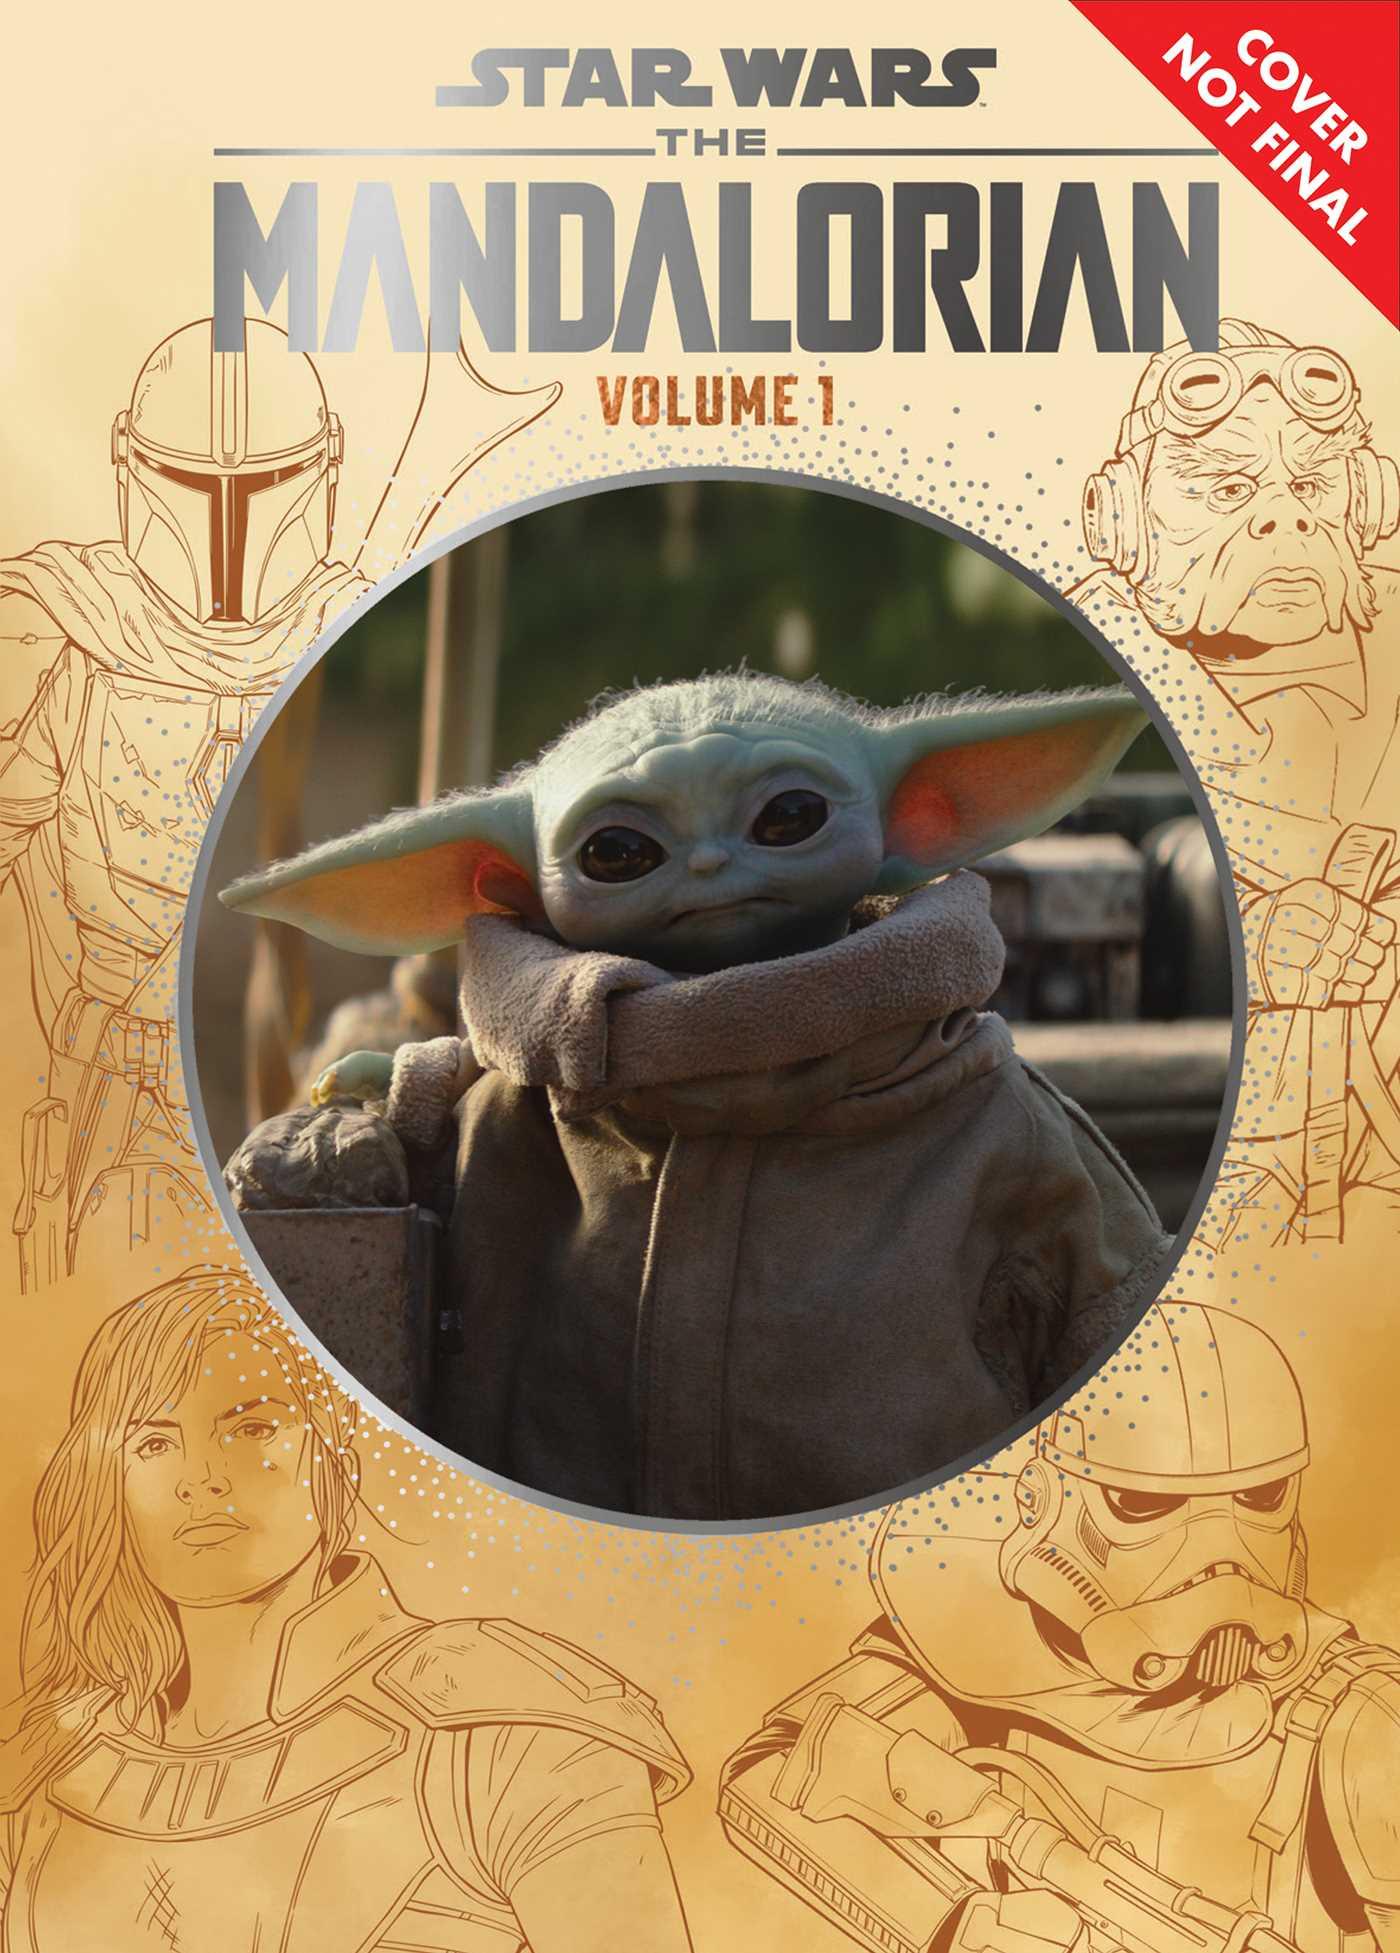 Star Wars: The Mandalorian (Studio Fun International)